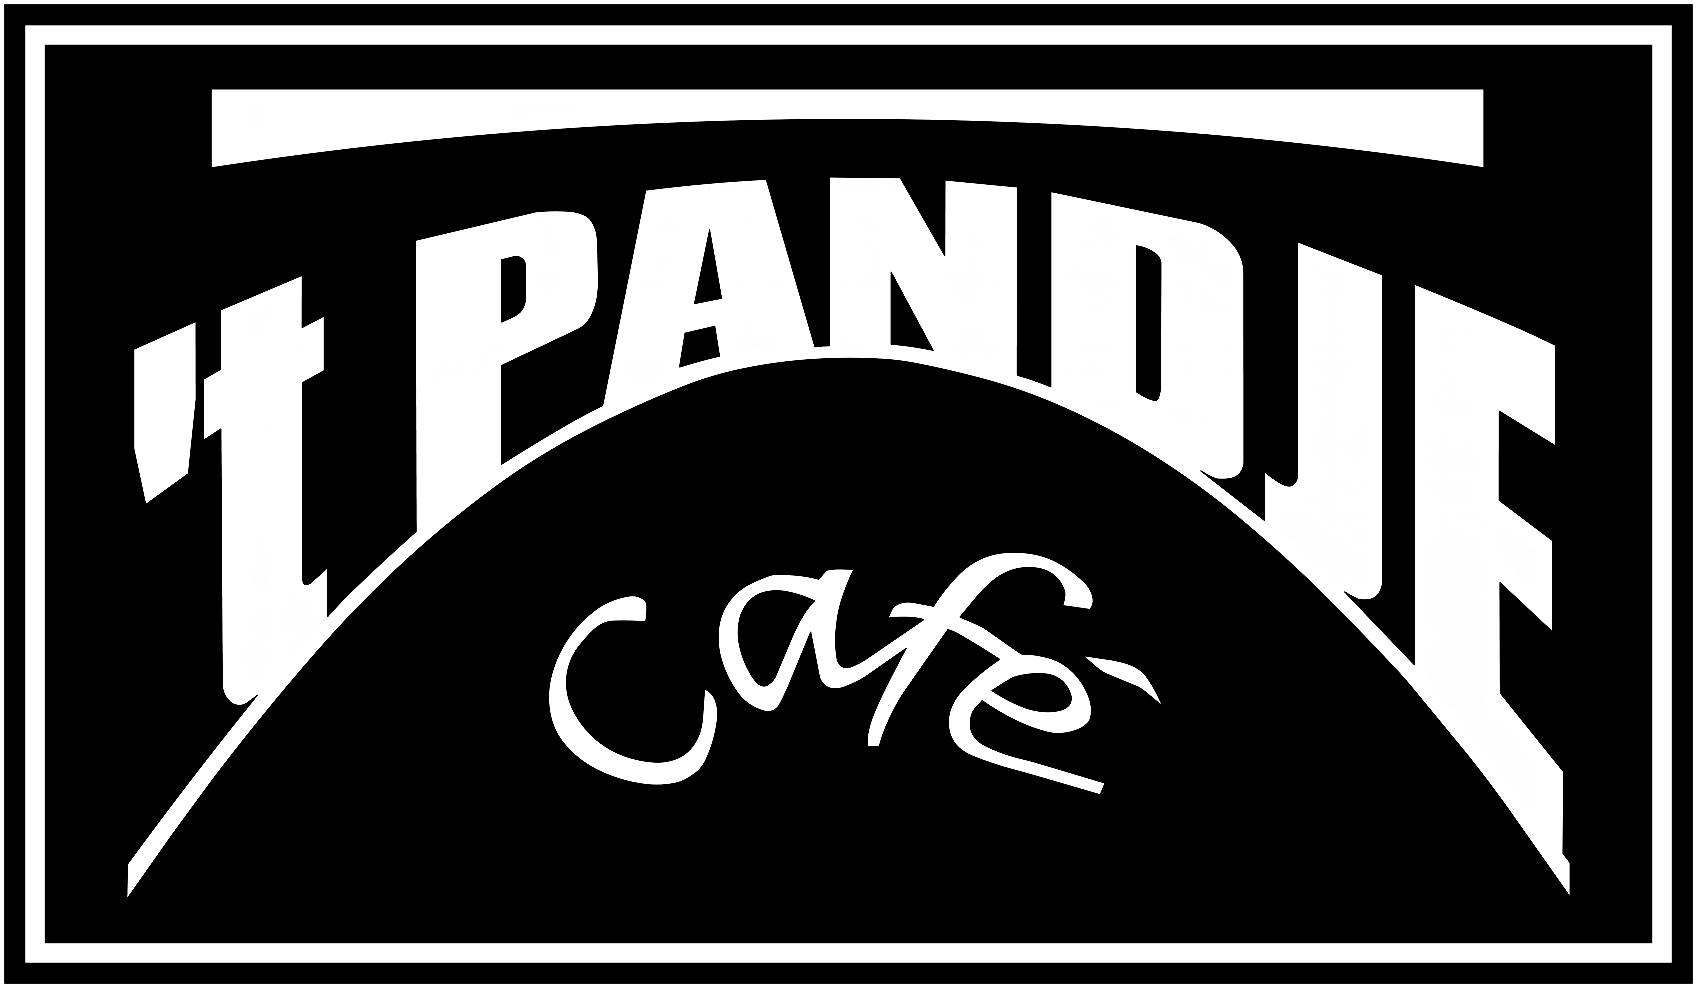 Debat Café 't Pandje